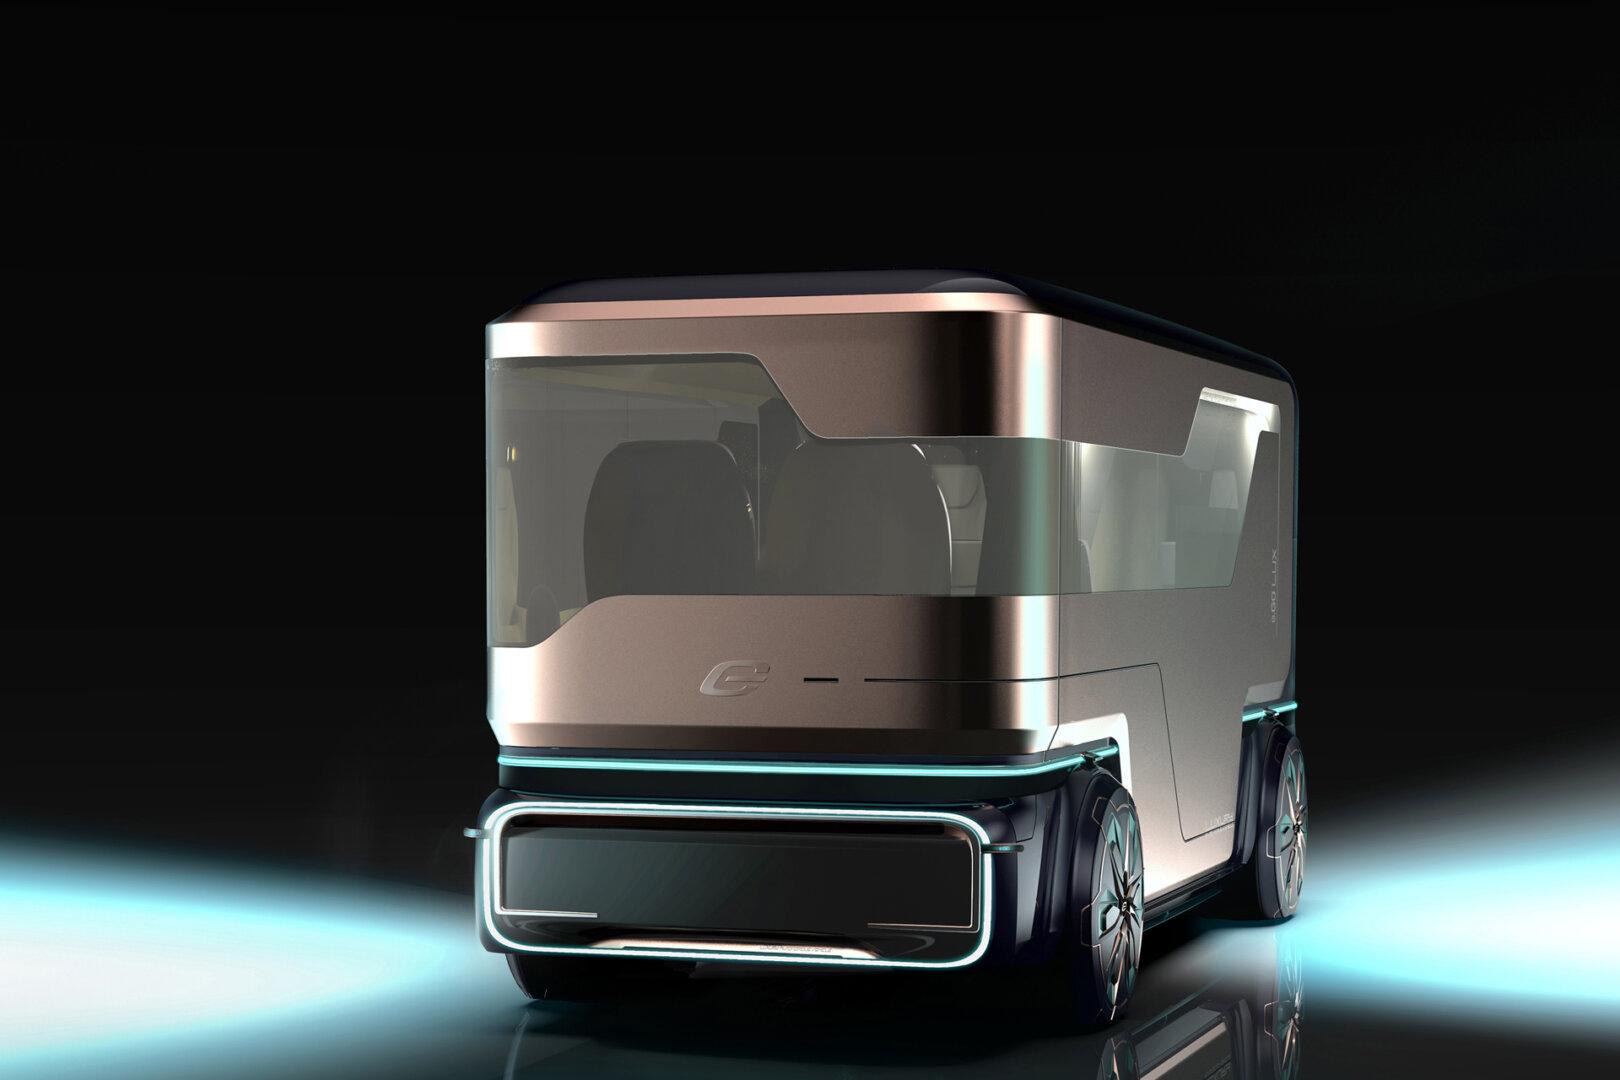 e.GO Lux Elektrobus